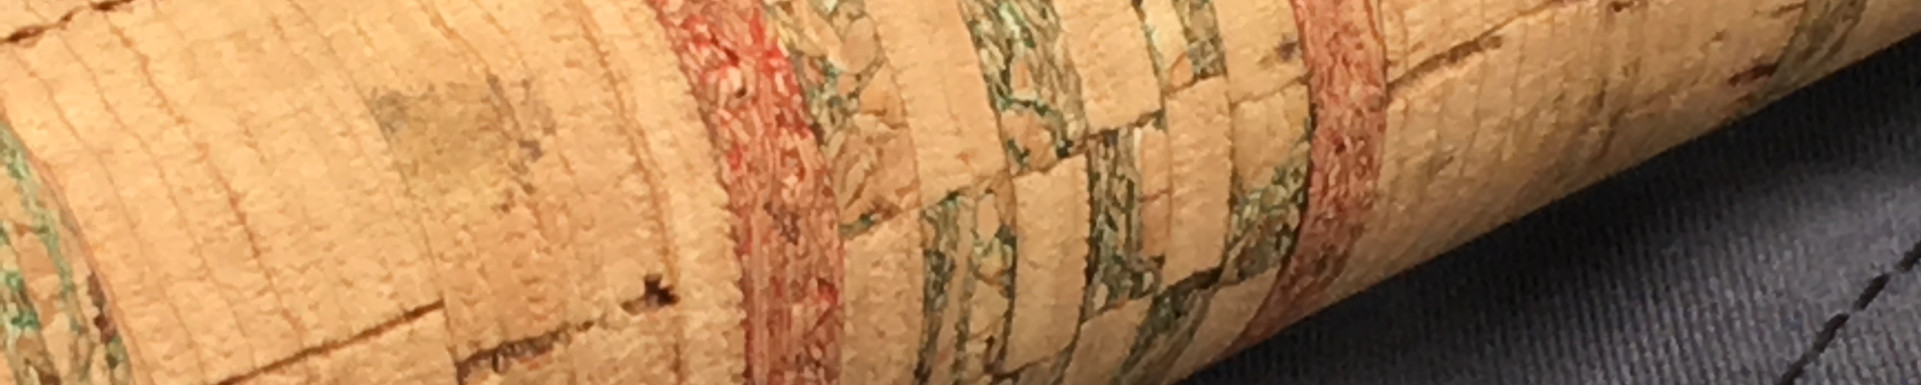 Checkered cork grip